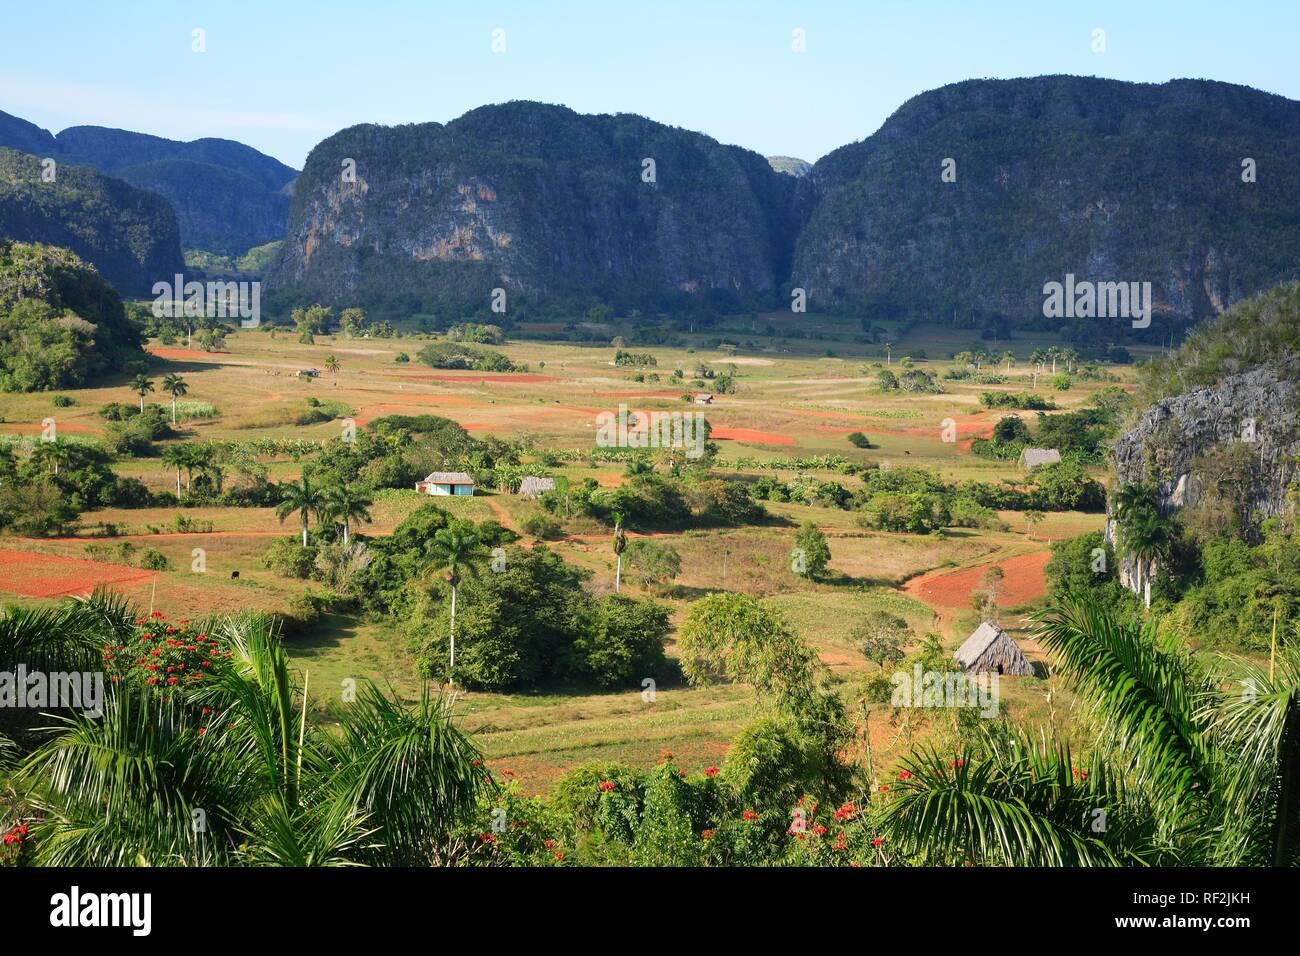 Valle de Vinales and the Mogotes chalk stone hills, Cuba, Caribbean - Stock Image